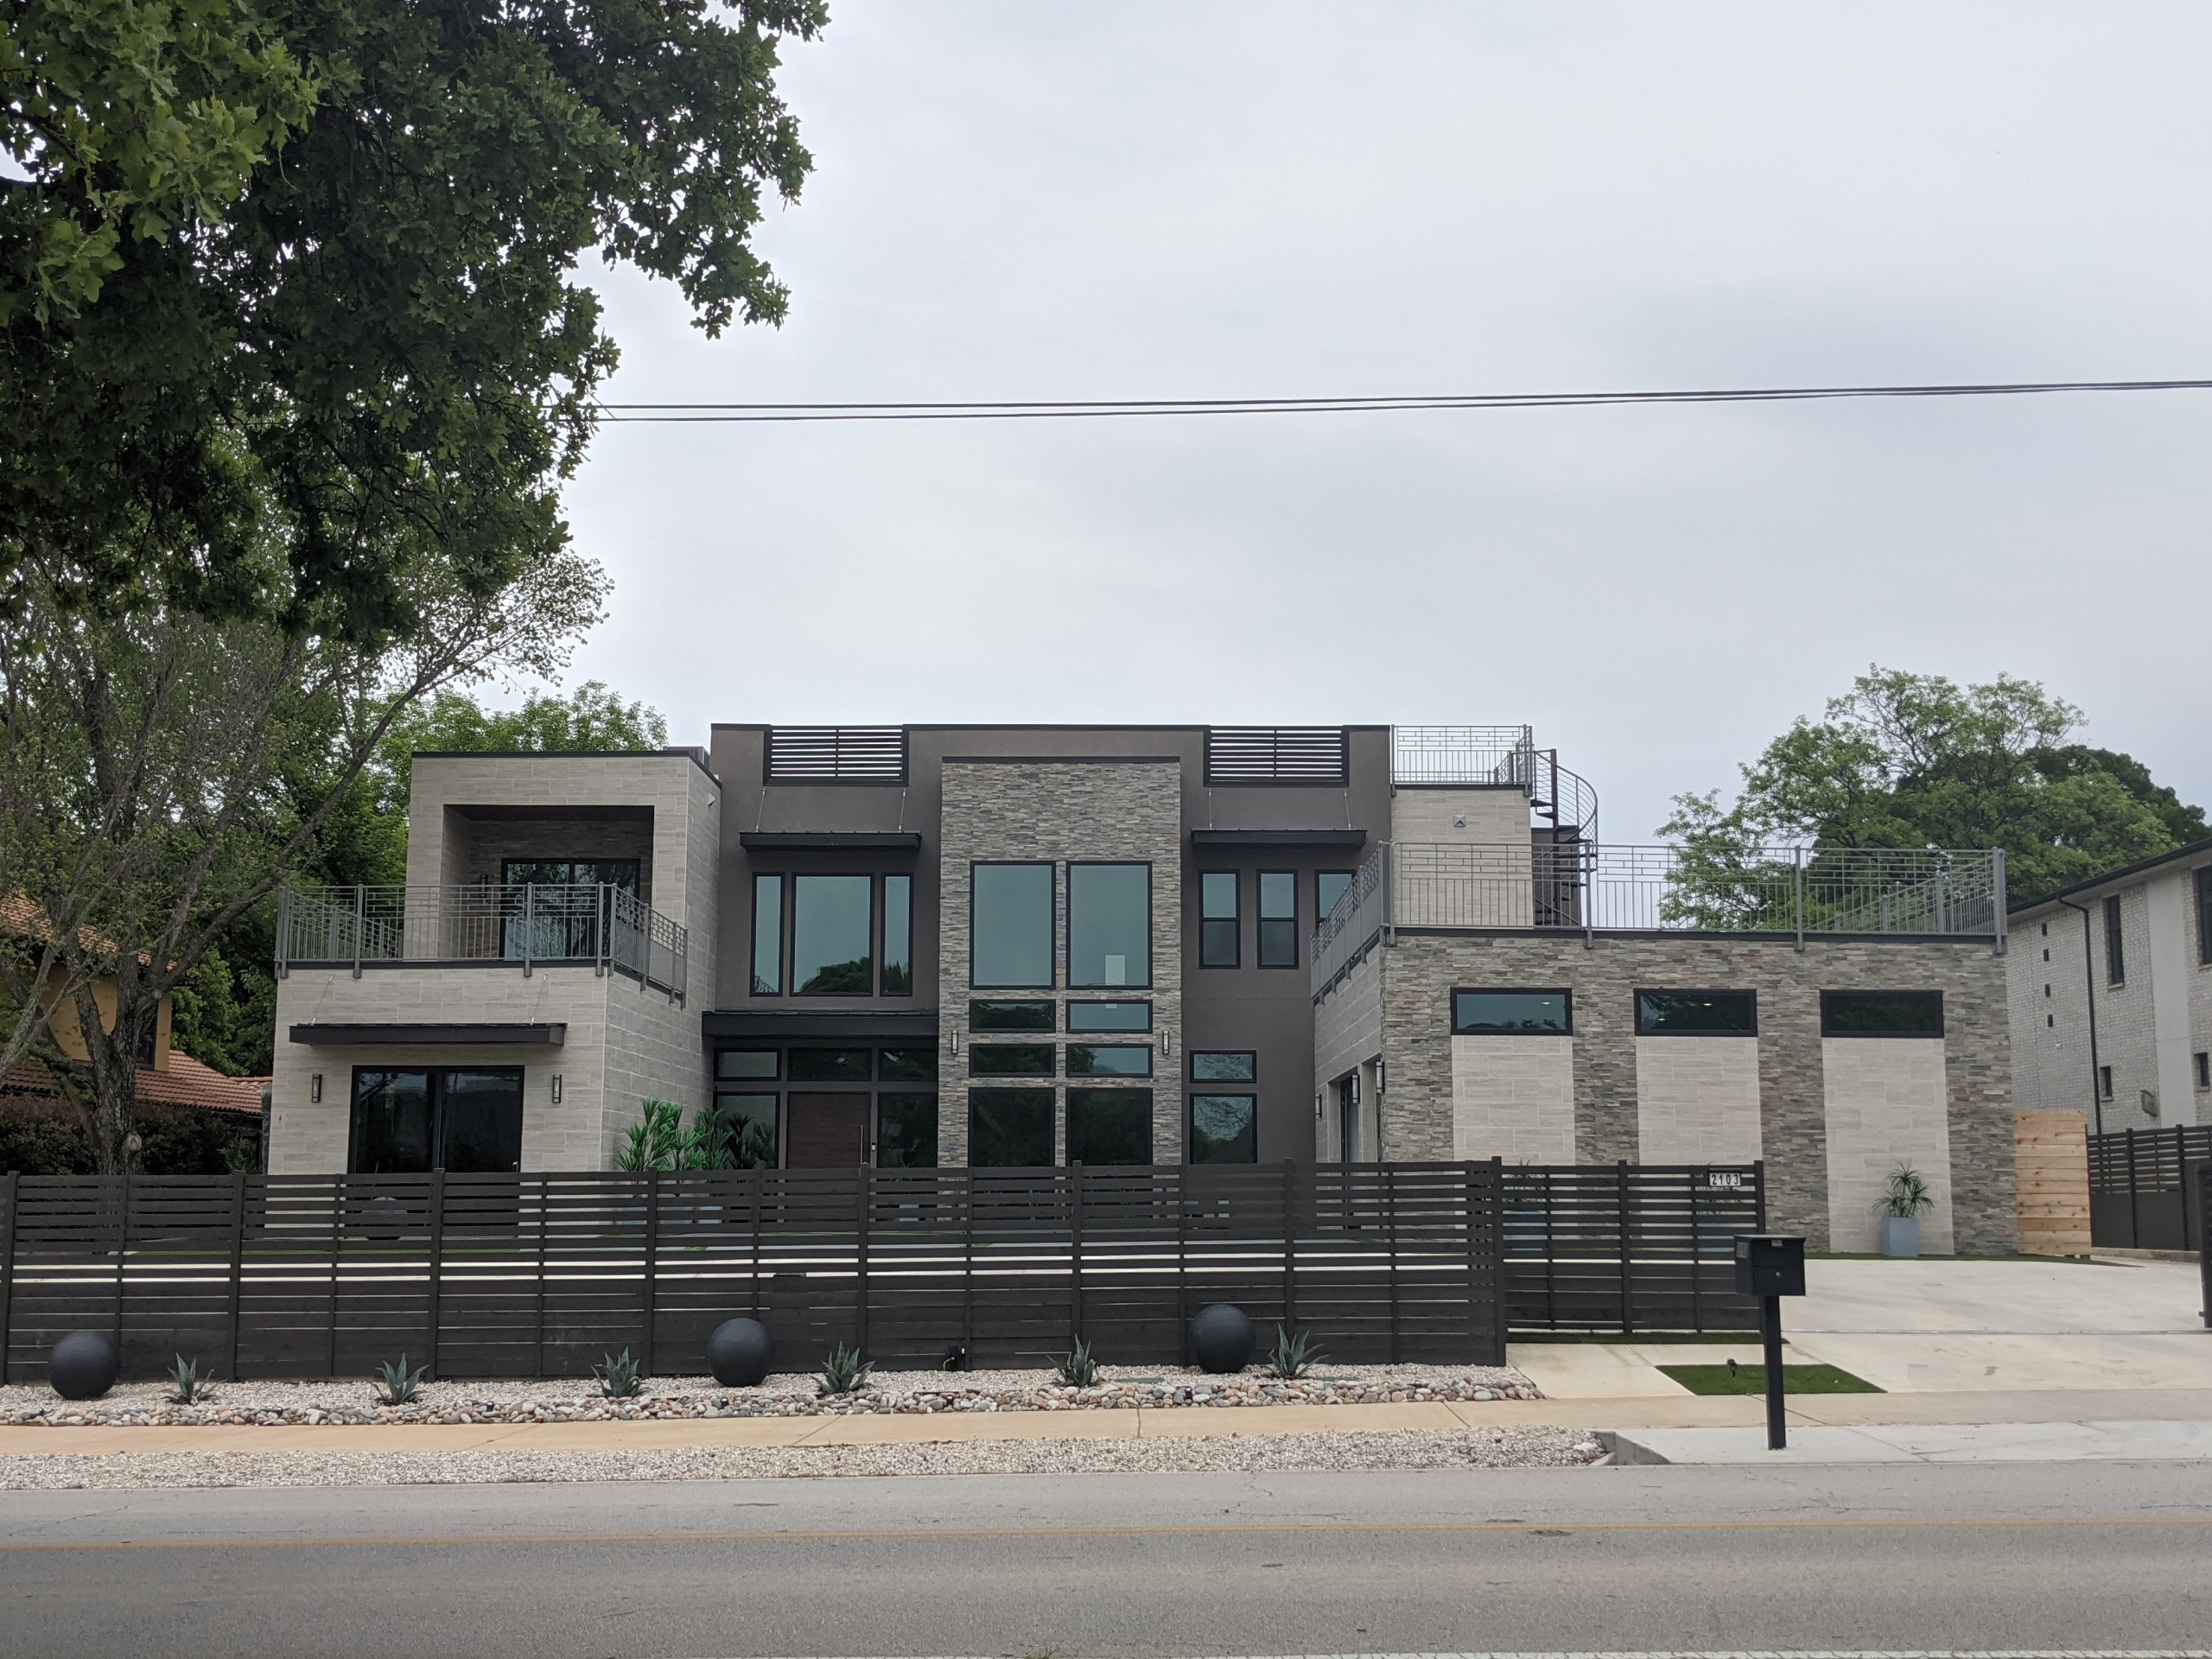 North Carroll Ave